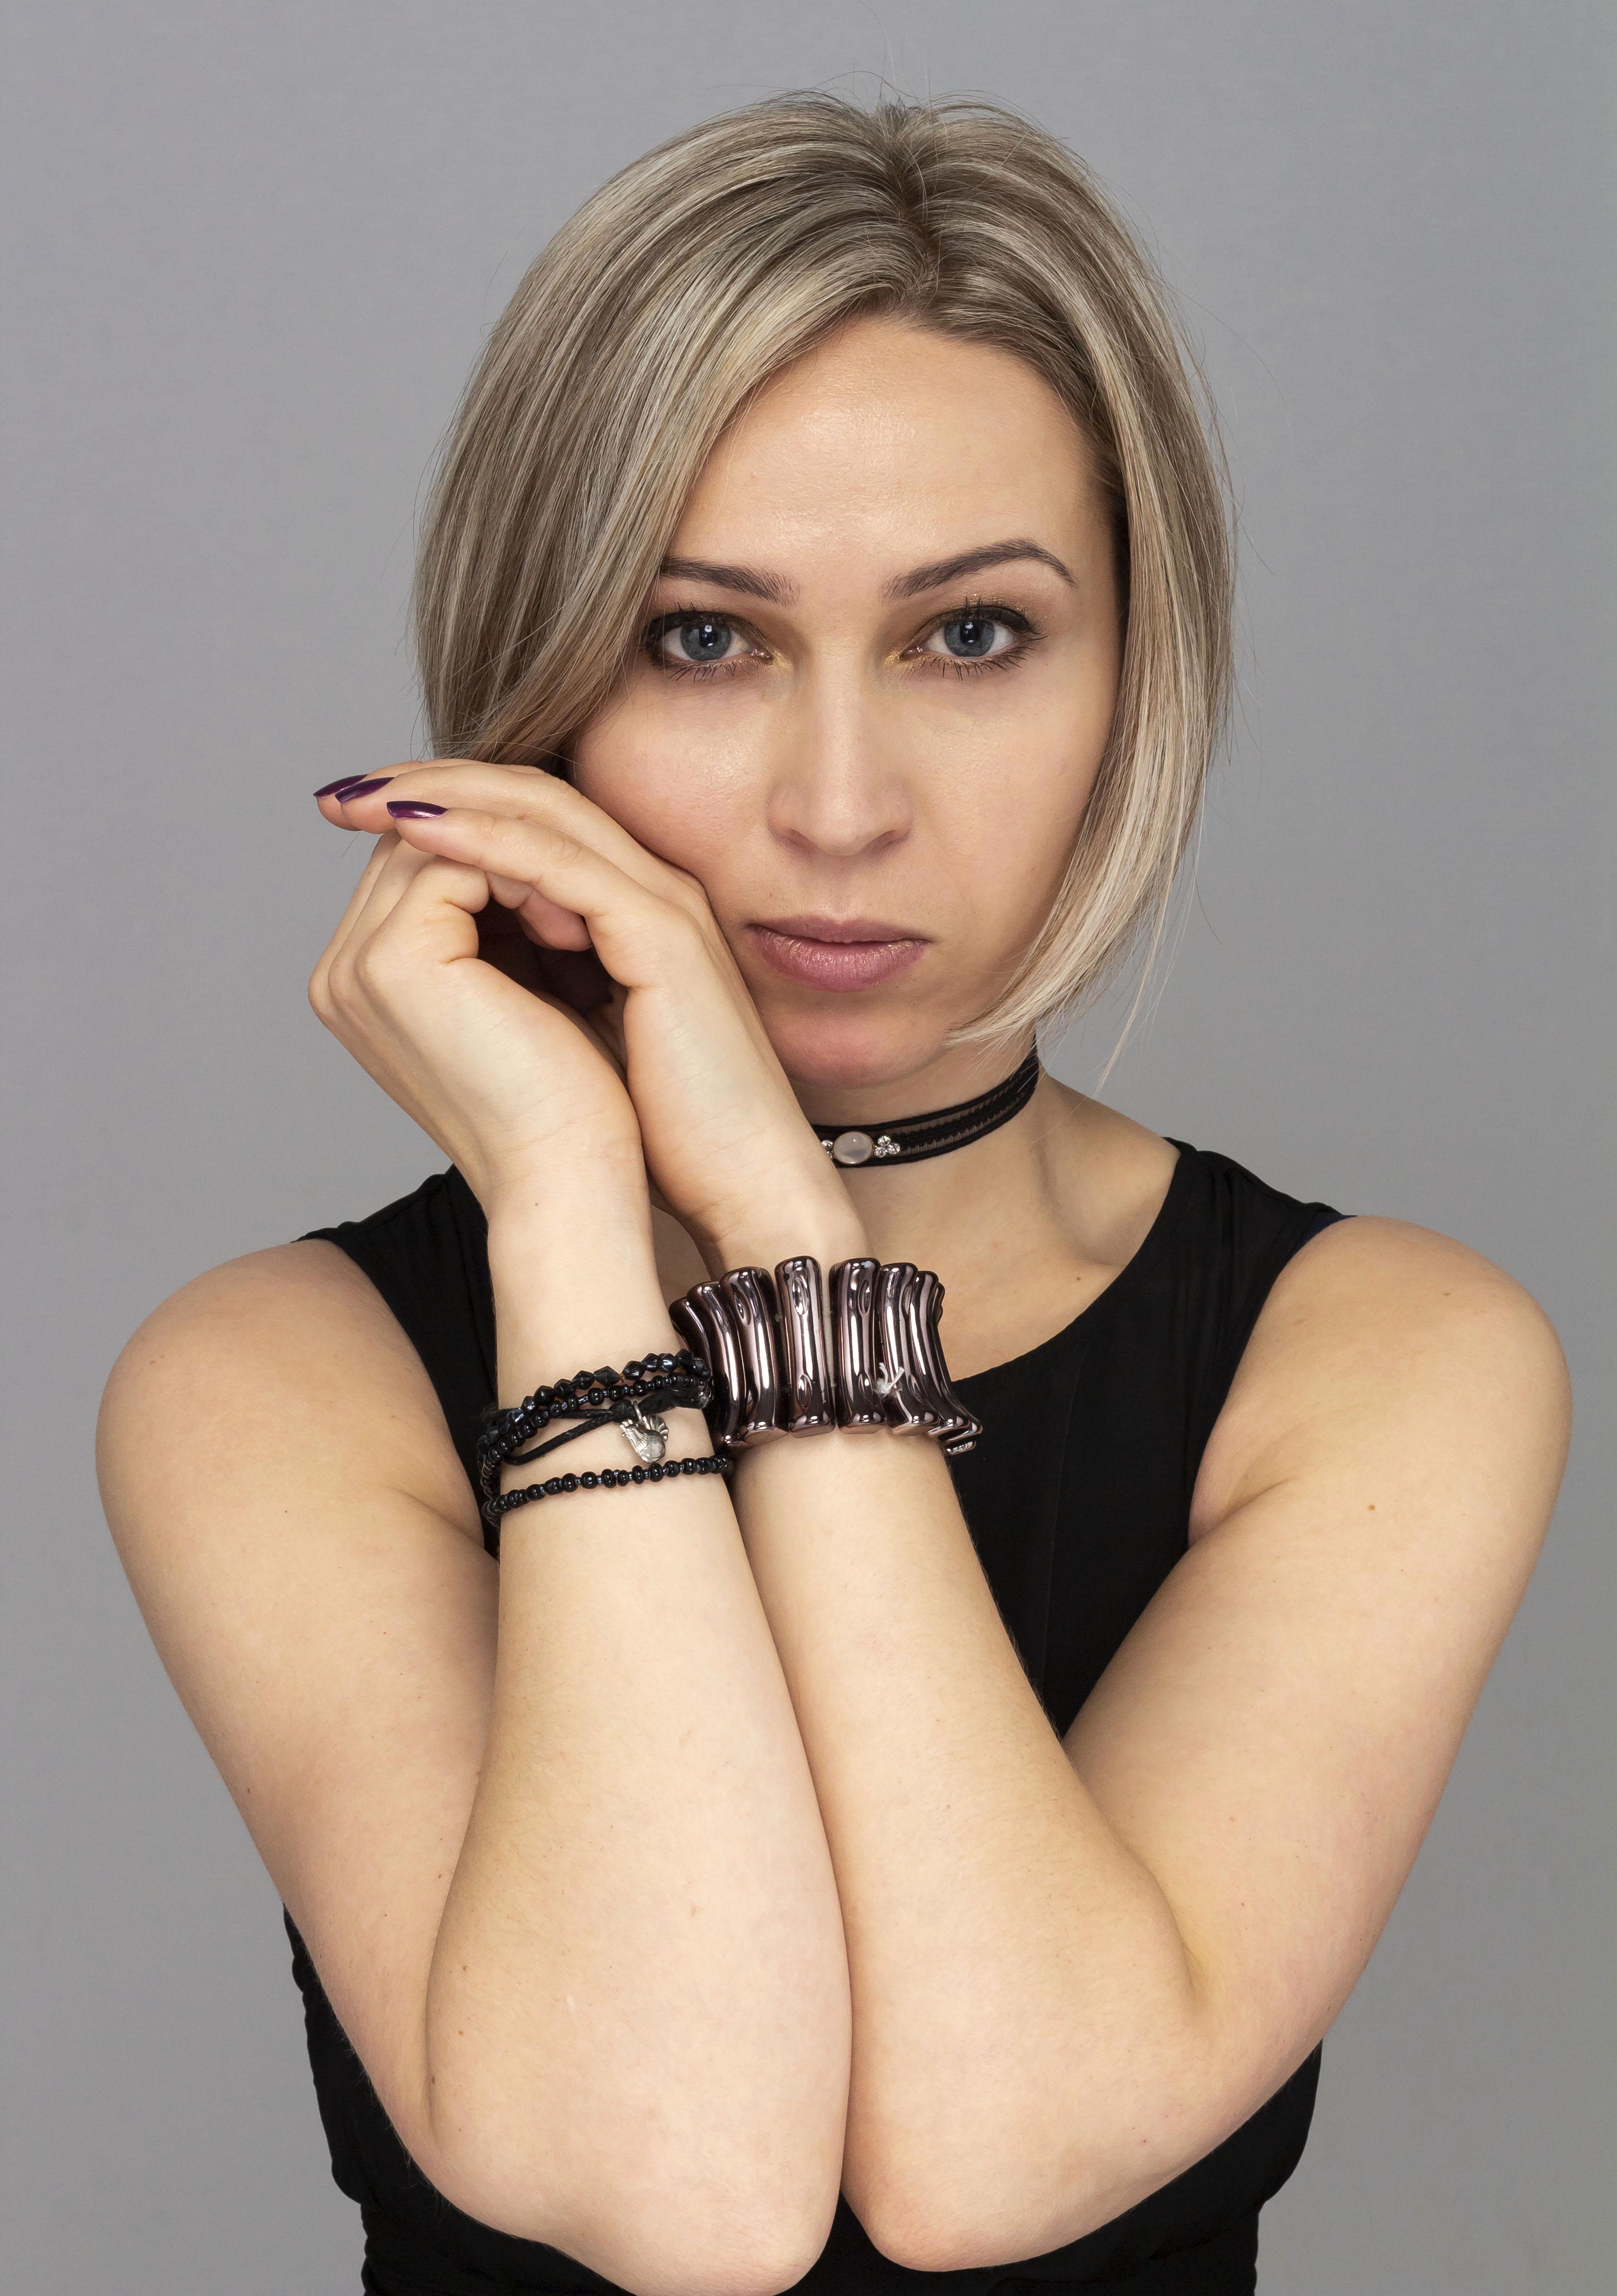 Chloe Archibald